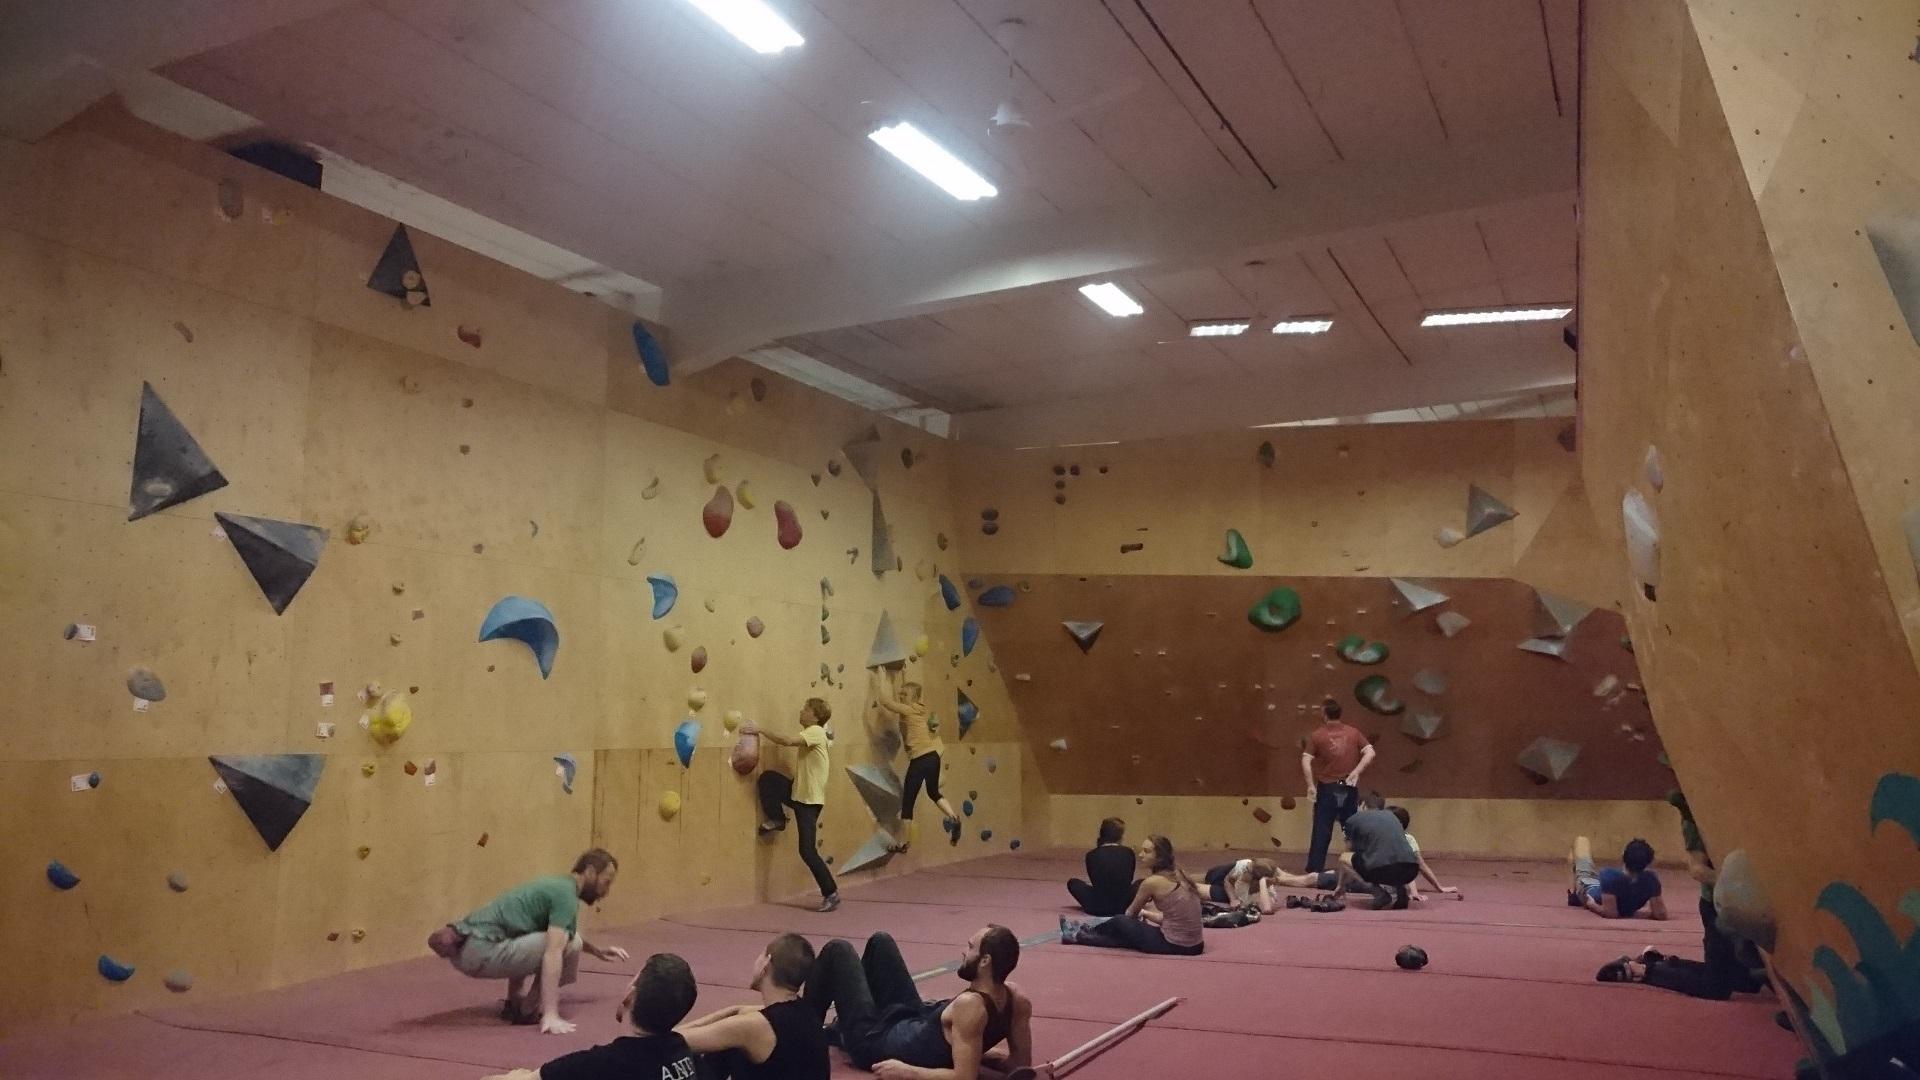 Boulderklub Kreuzberg i Berlin.